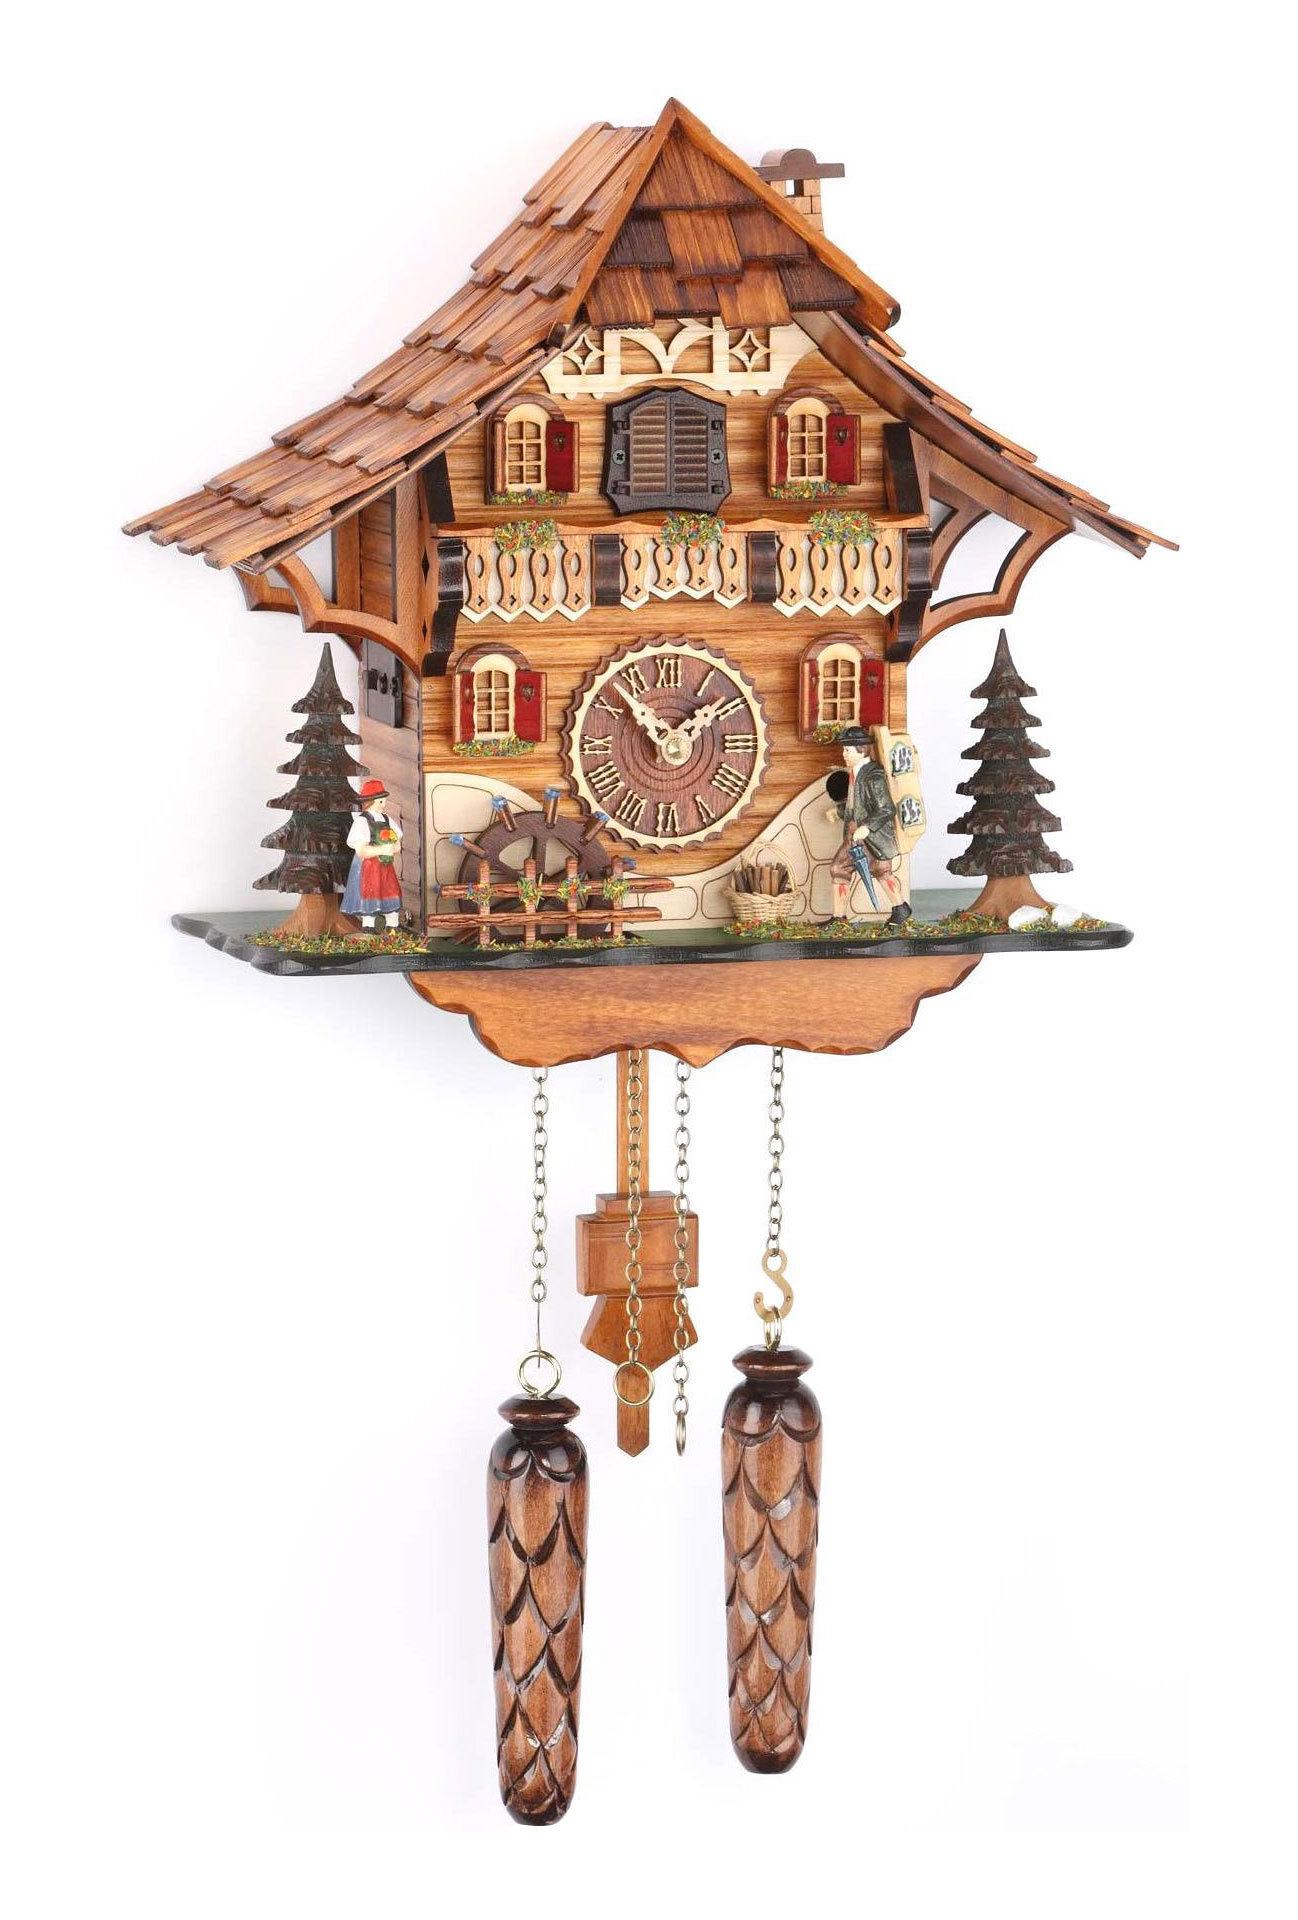 Часы настенные Часы настенные с кукушкой Trenkle 478 QM HZZG chasy-nastennye-s-kukushkoy-trenkle-478-qm-hzzg-germaniya.jpg